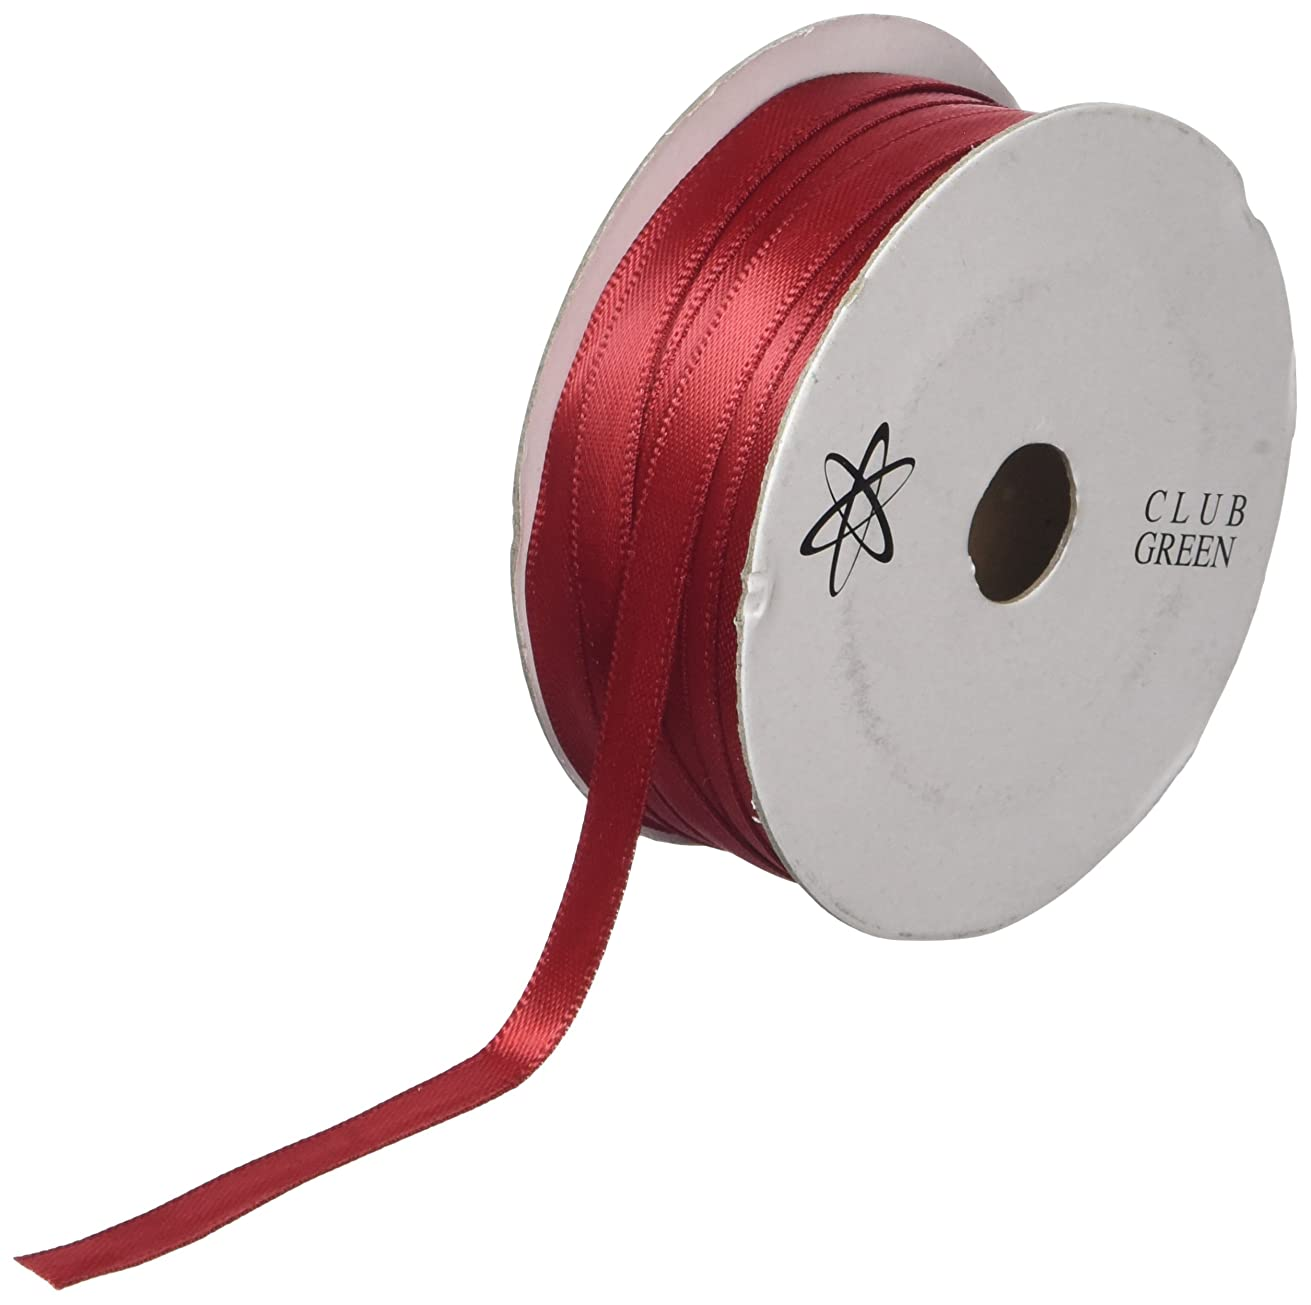 Club Green D/Satin Ribbon 6MMX25M Ruby, Fabric, 10 x 10 x 1 cm